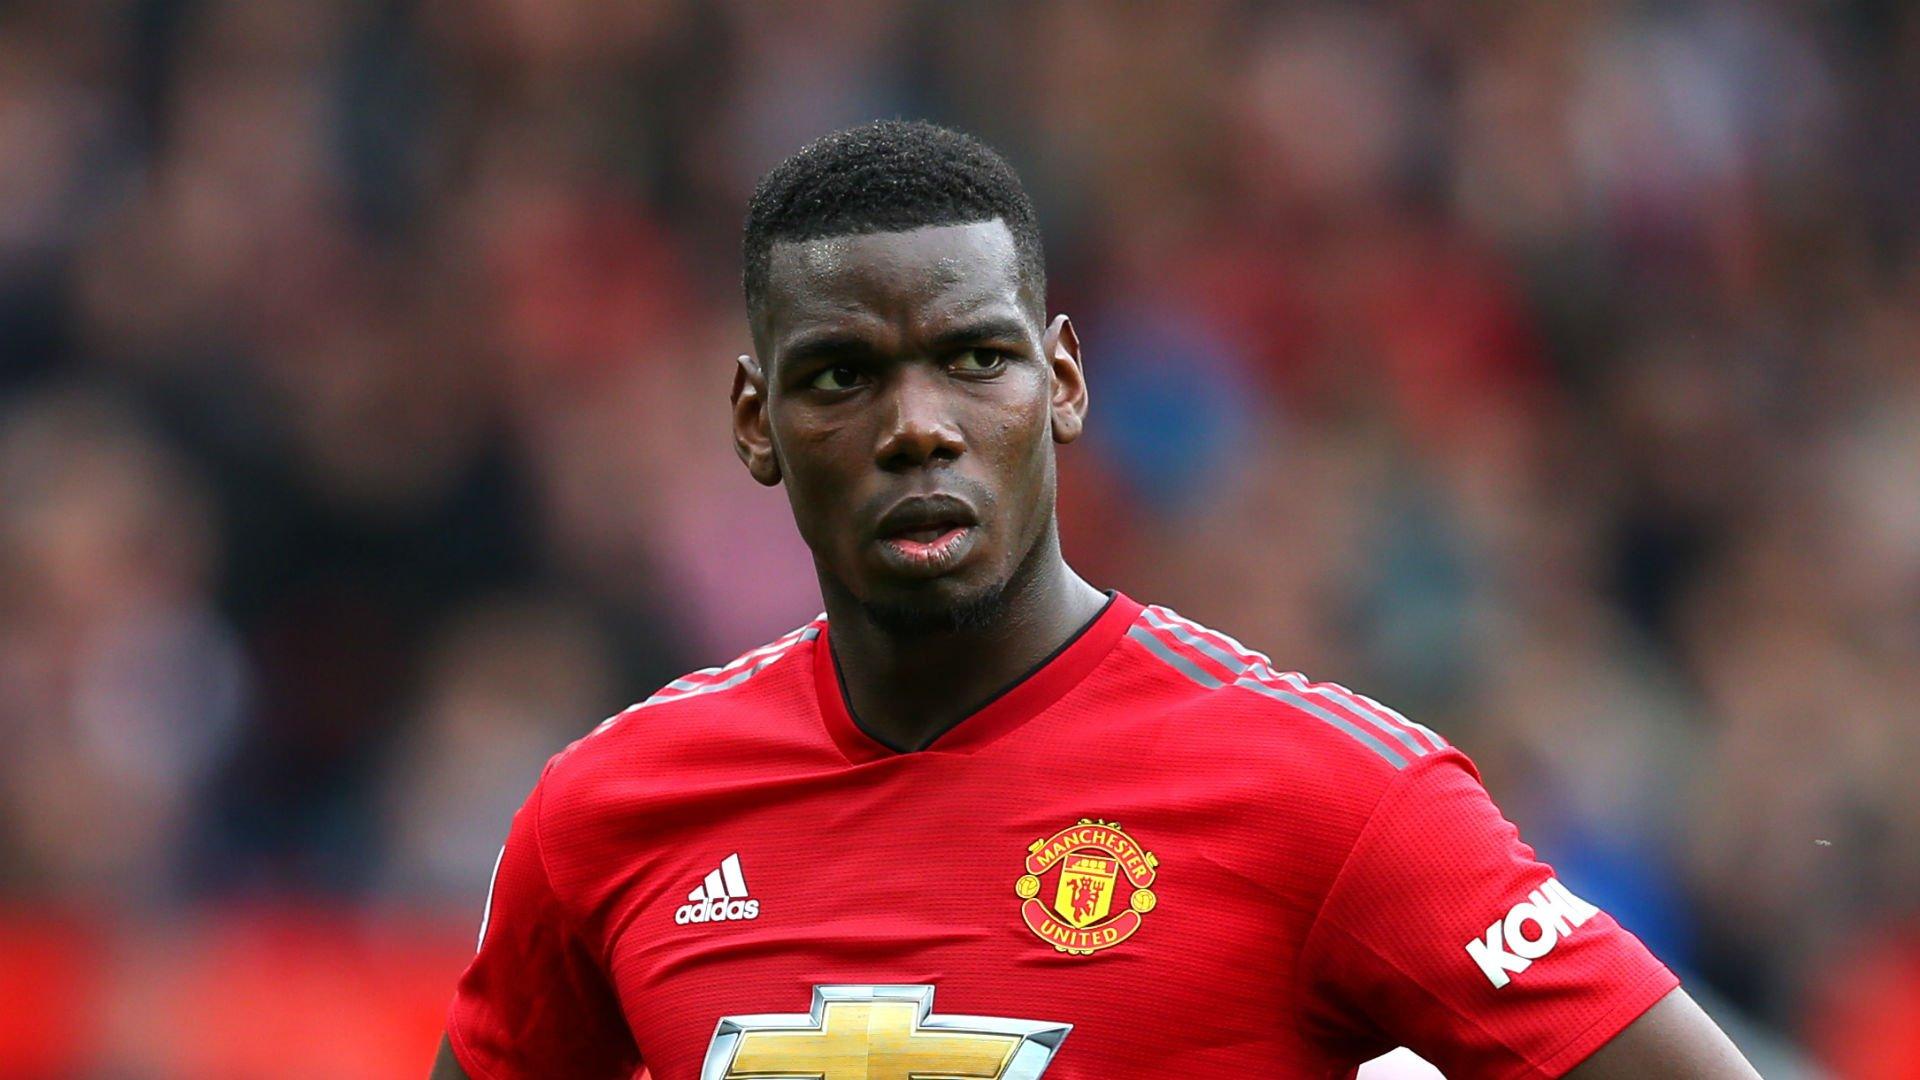 pogba cropped 1bbgi3vlsstqx1bkoc303kk3aj - Transfer: Pogba's agent confirms player is about to leave Man Utd